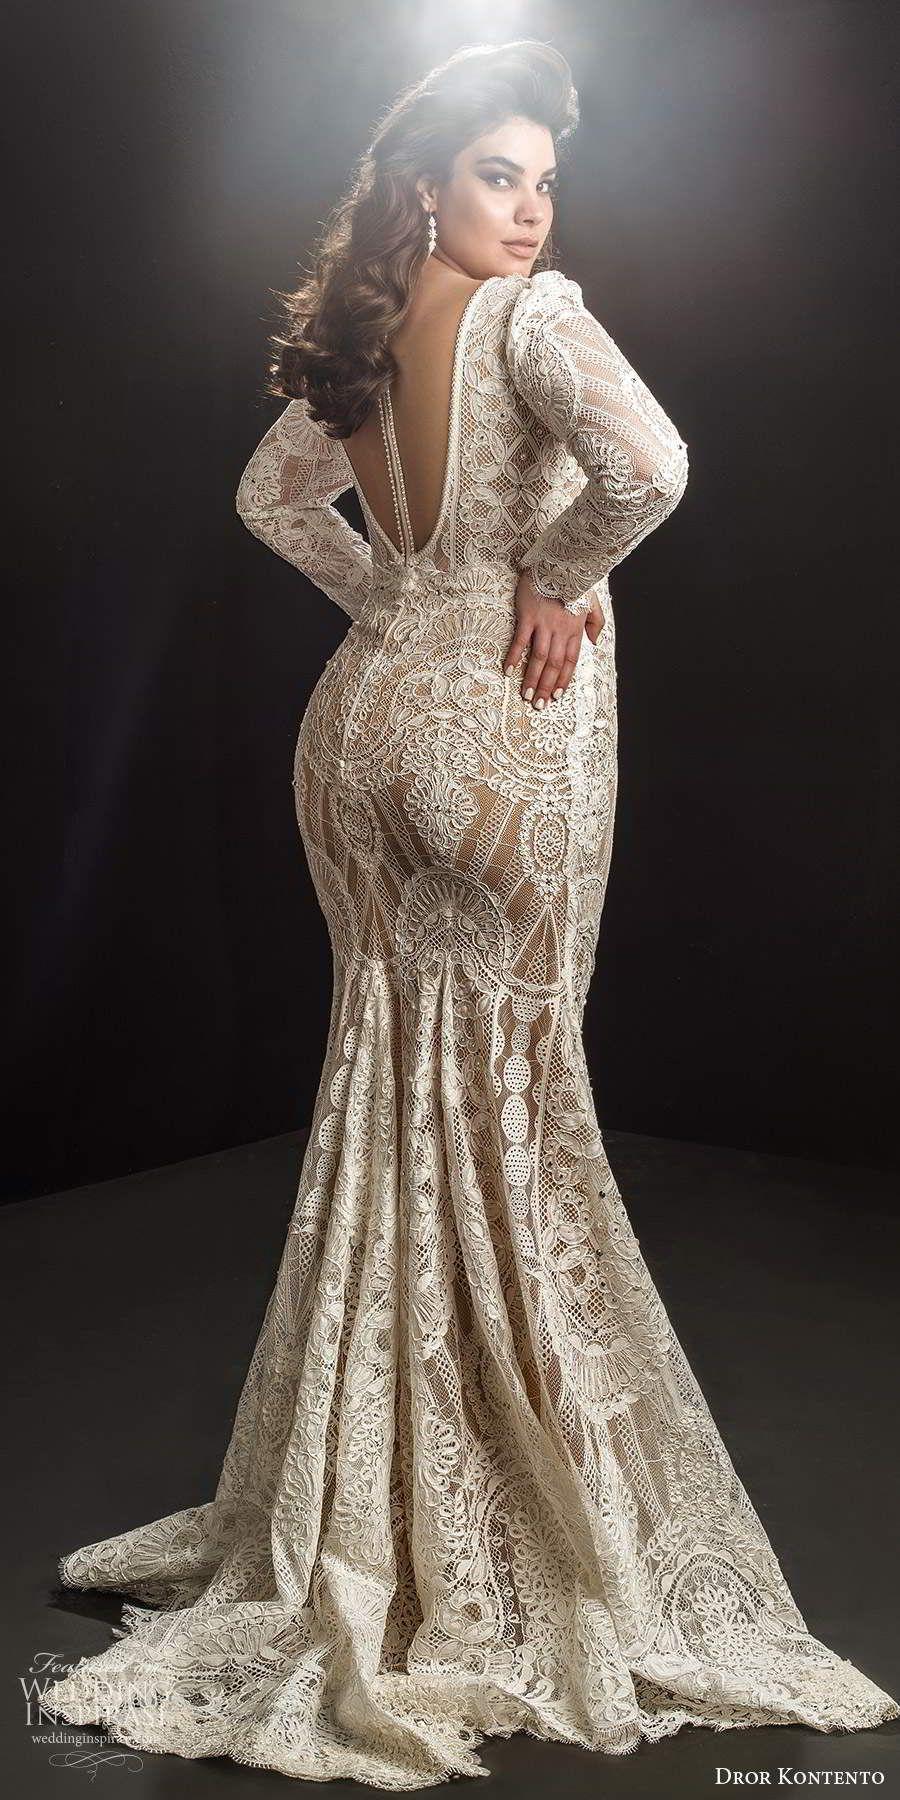 Dror Kontento 2019 Plus Size Wedding Dresses Wedding Inspirasi In 2021 Plus Size Wedding Gowns Wedding Dress Long Sleeve Wedding Dresses Plus Size [ 1800 x 900 Pixel ]